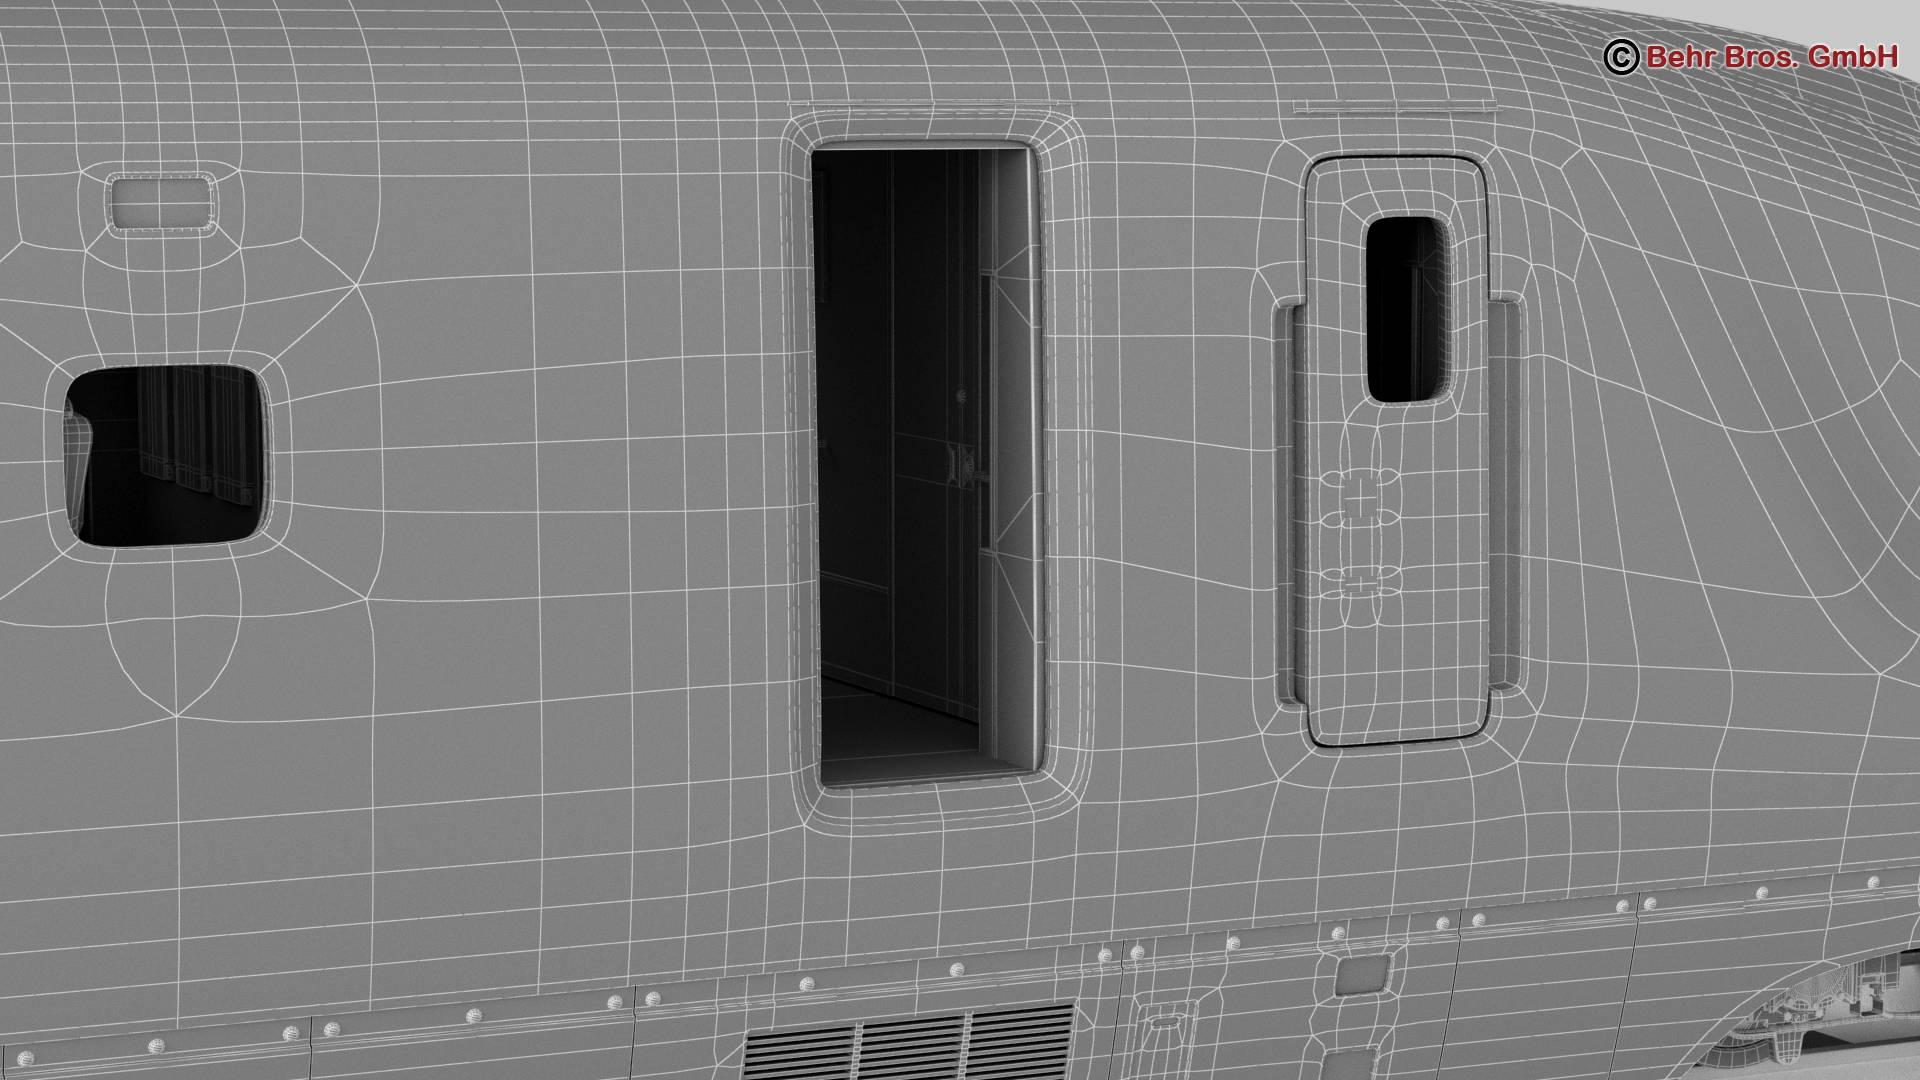 shinkansen e7 3d model 3ds max fbx c4d lwo ma mb obj 265680